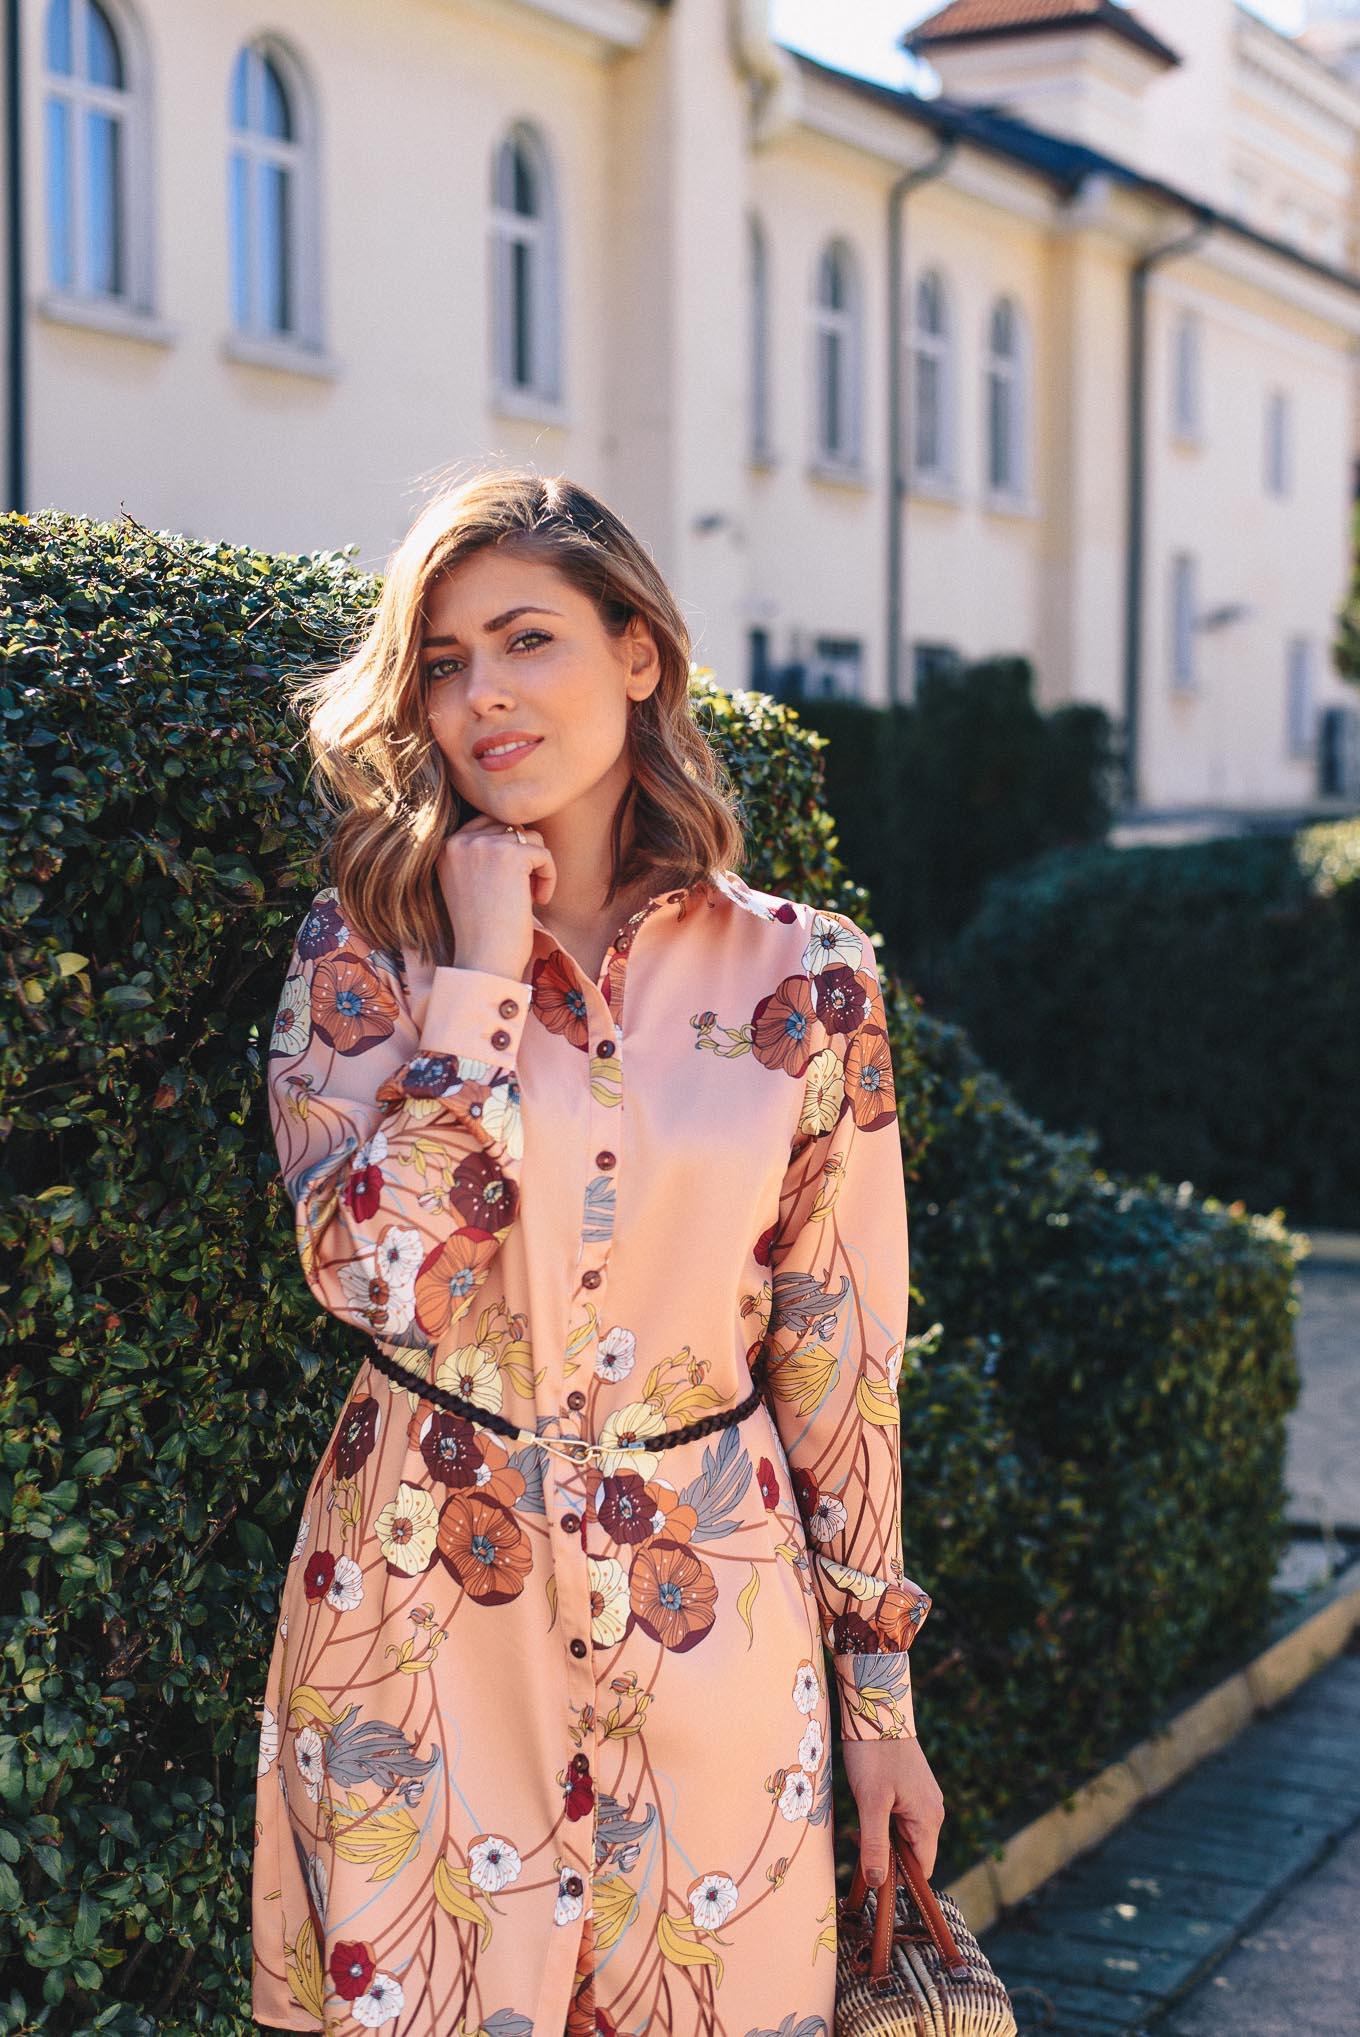 Bulgarian fashion and lifestyle blogger